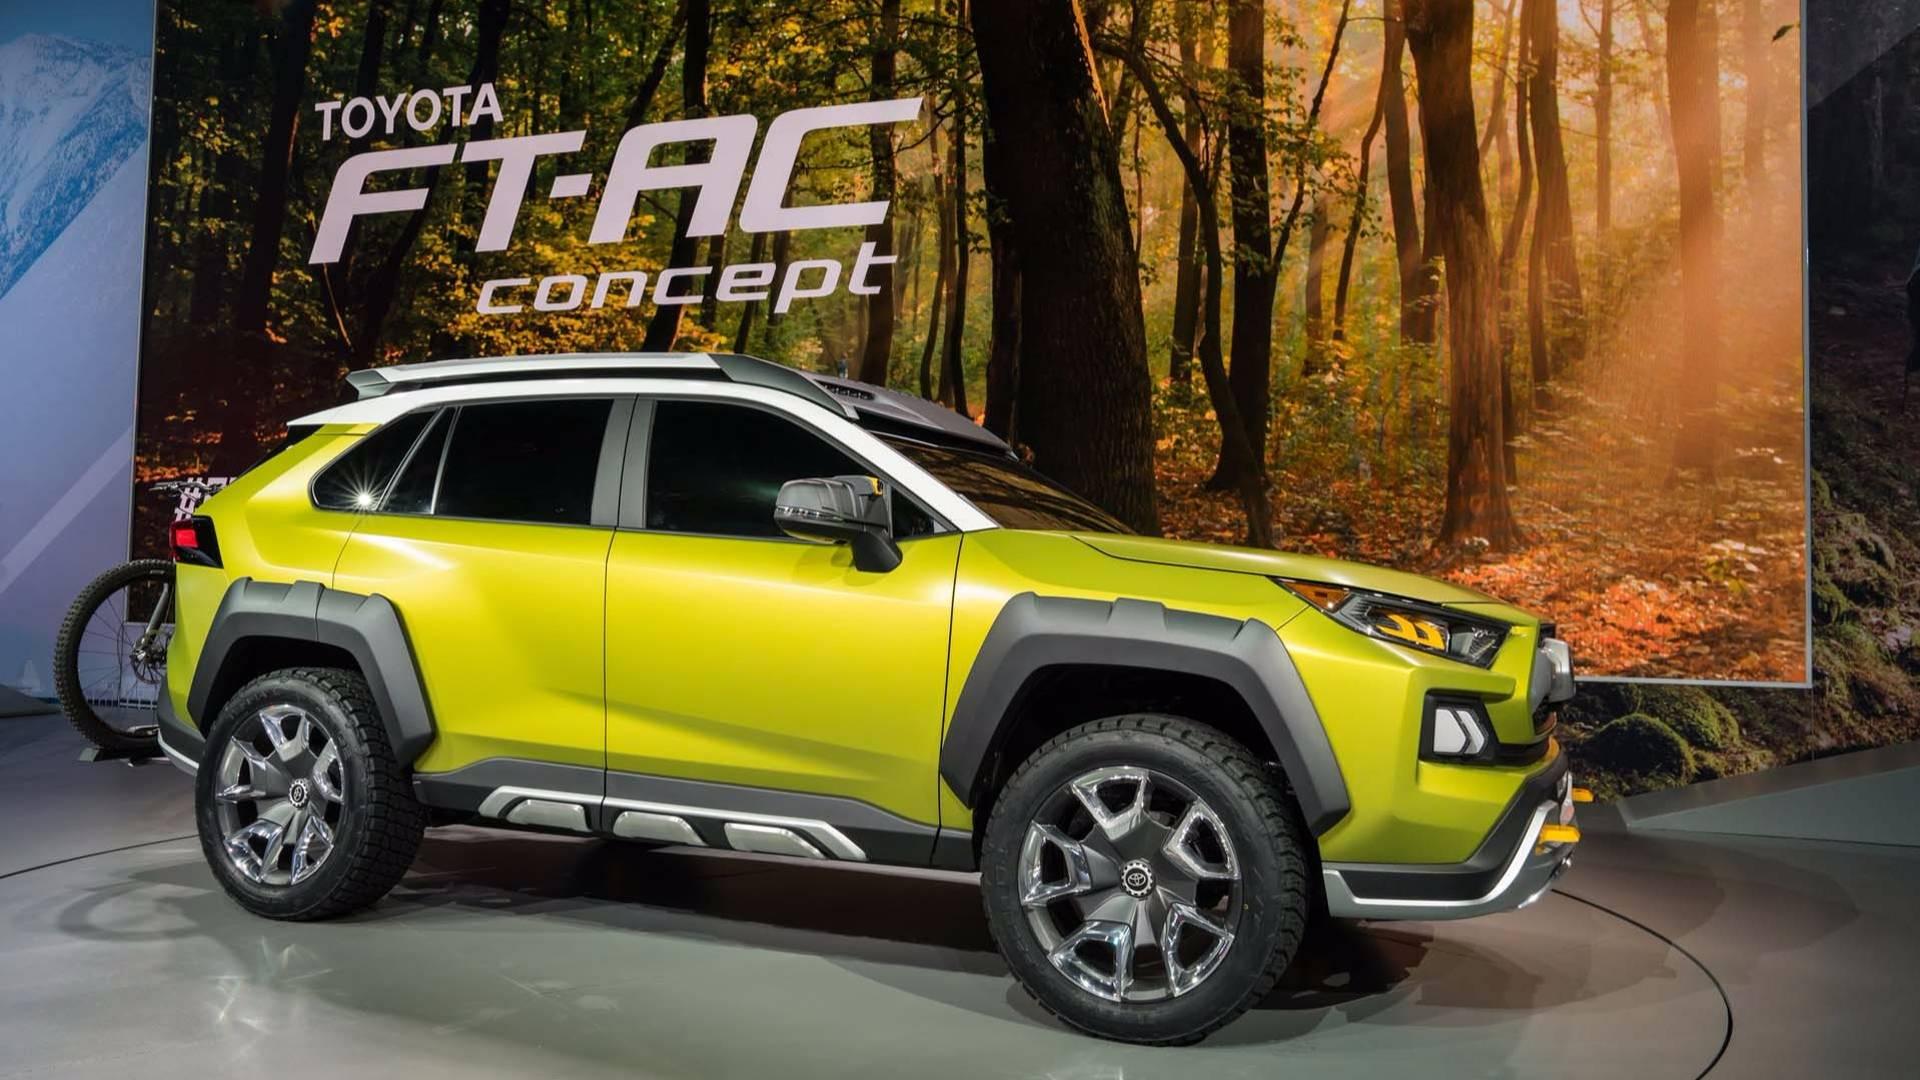 Kelebihan Toyota Ft Spesifikasi